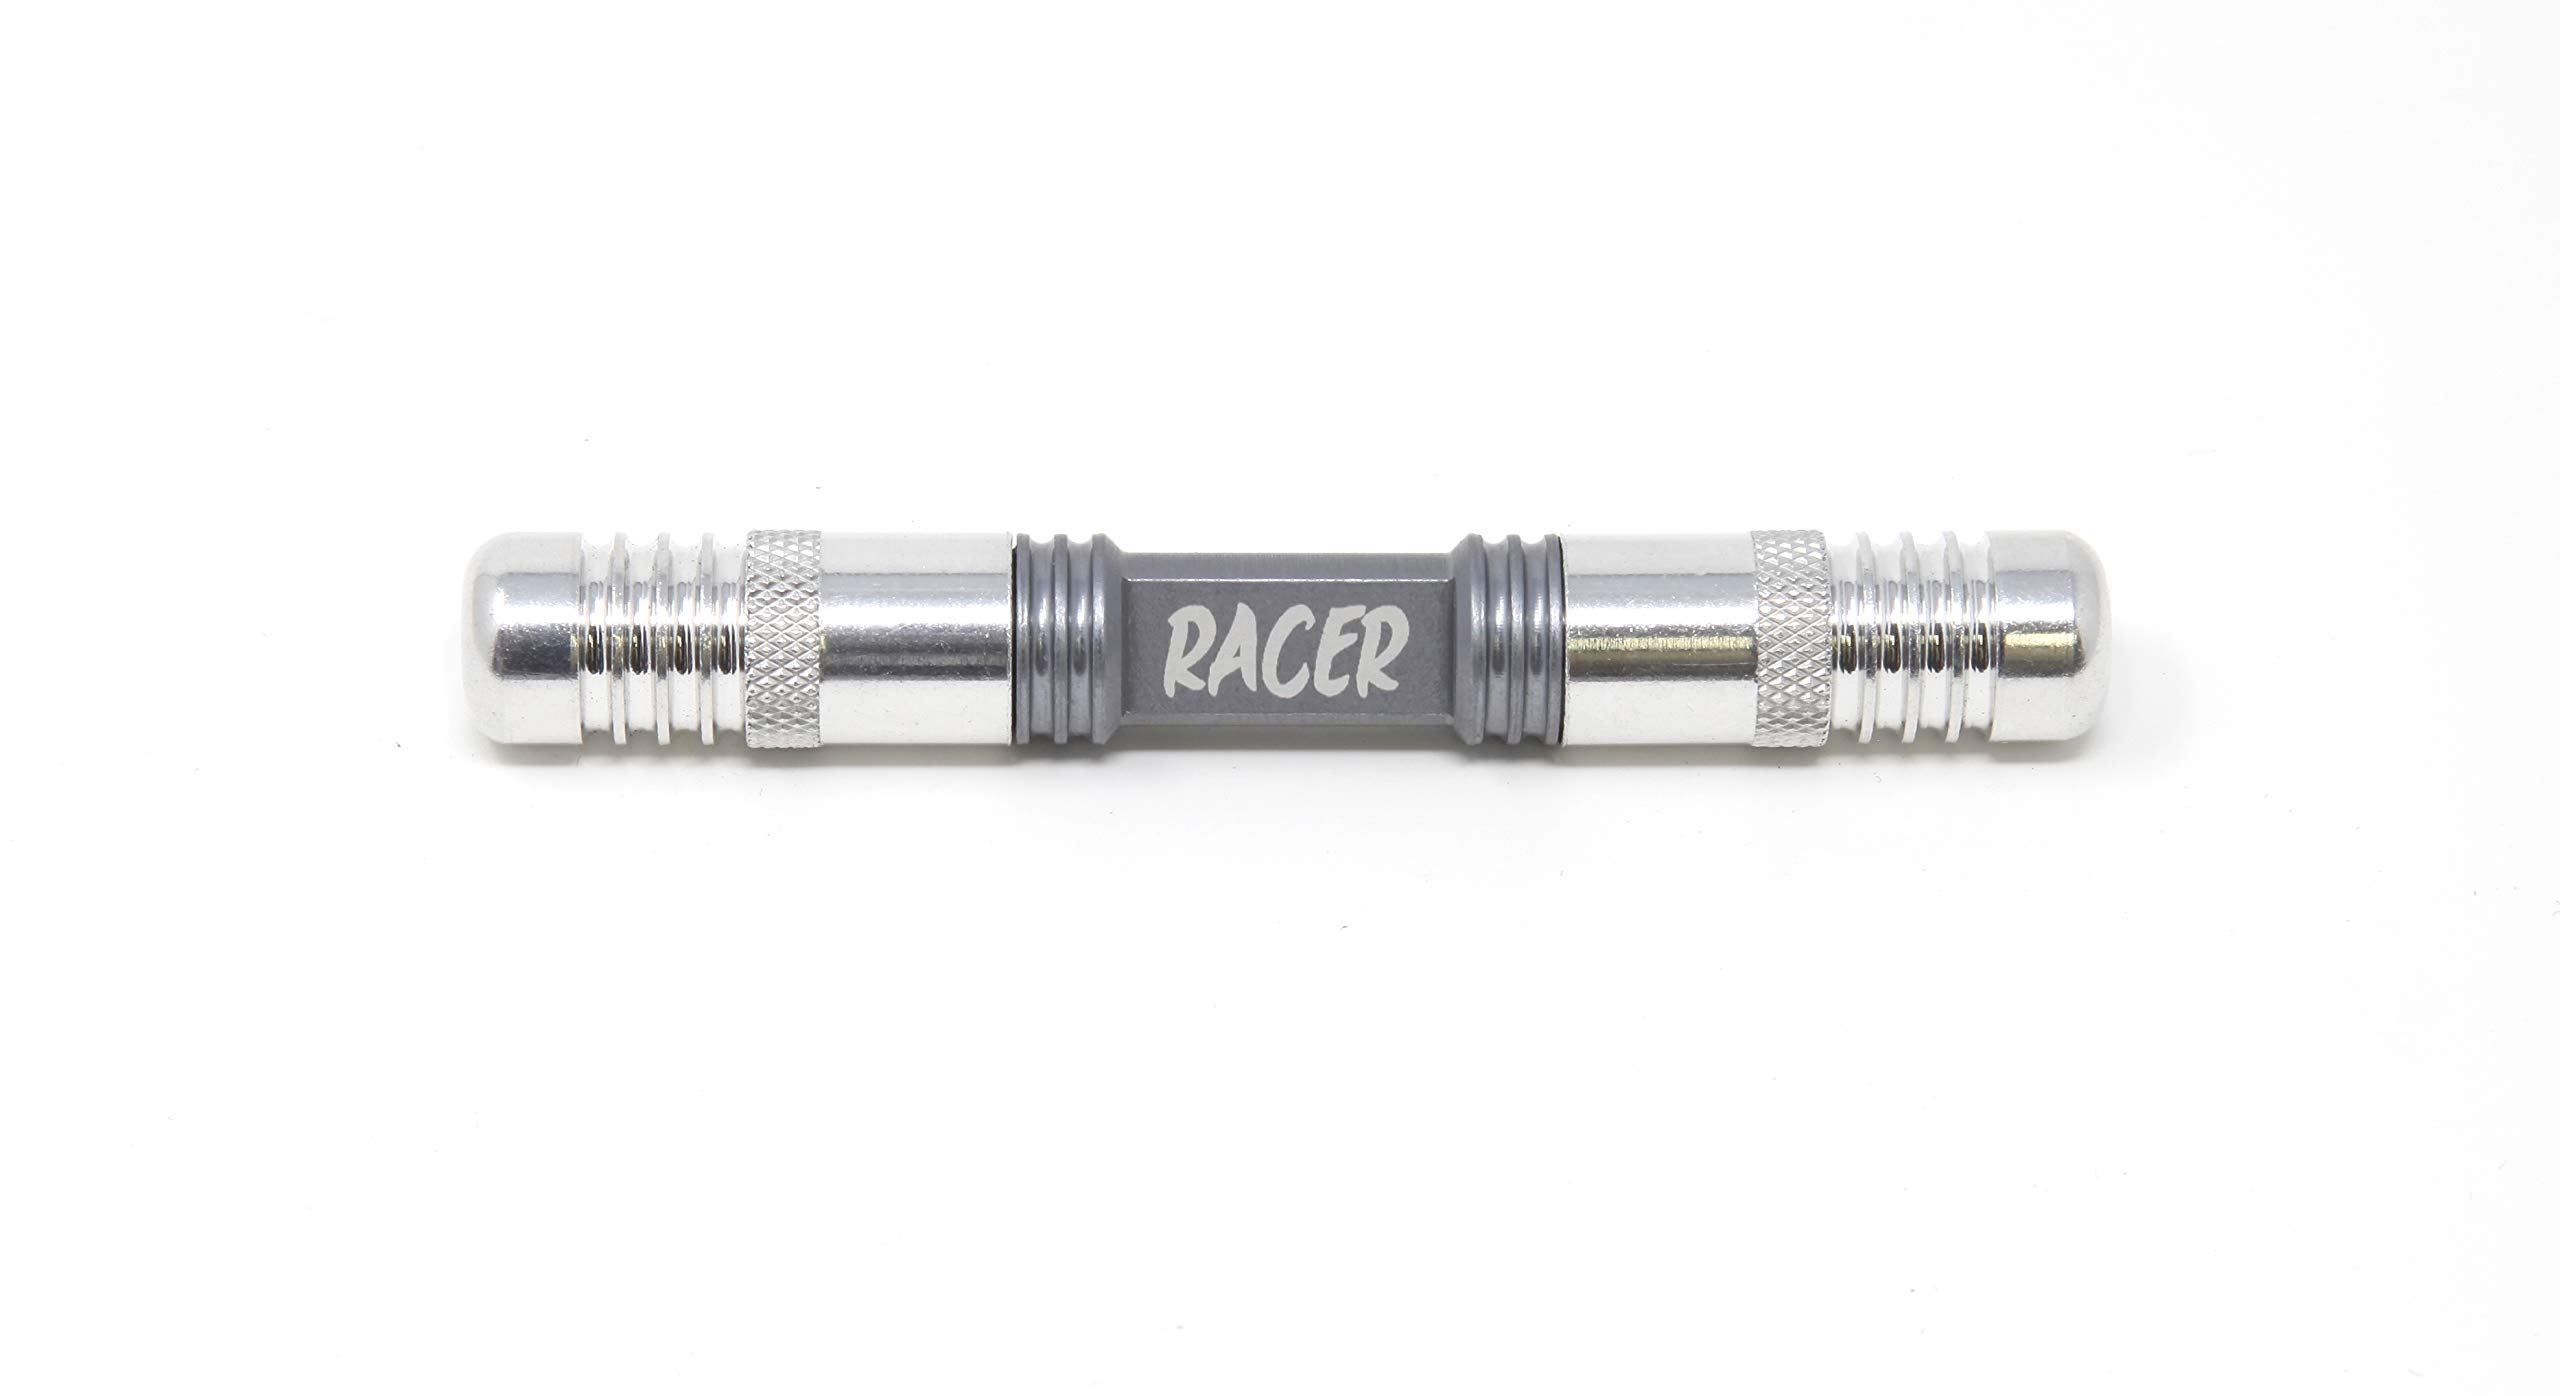 Dynaplug Racer Bicycle Tire Repair Tool (Gun Metal/POL)